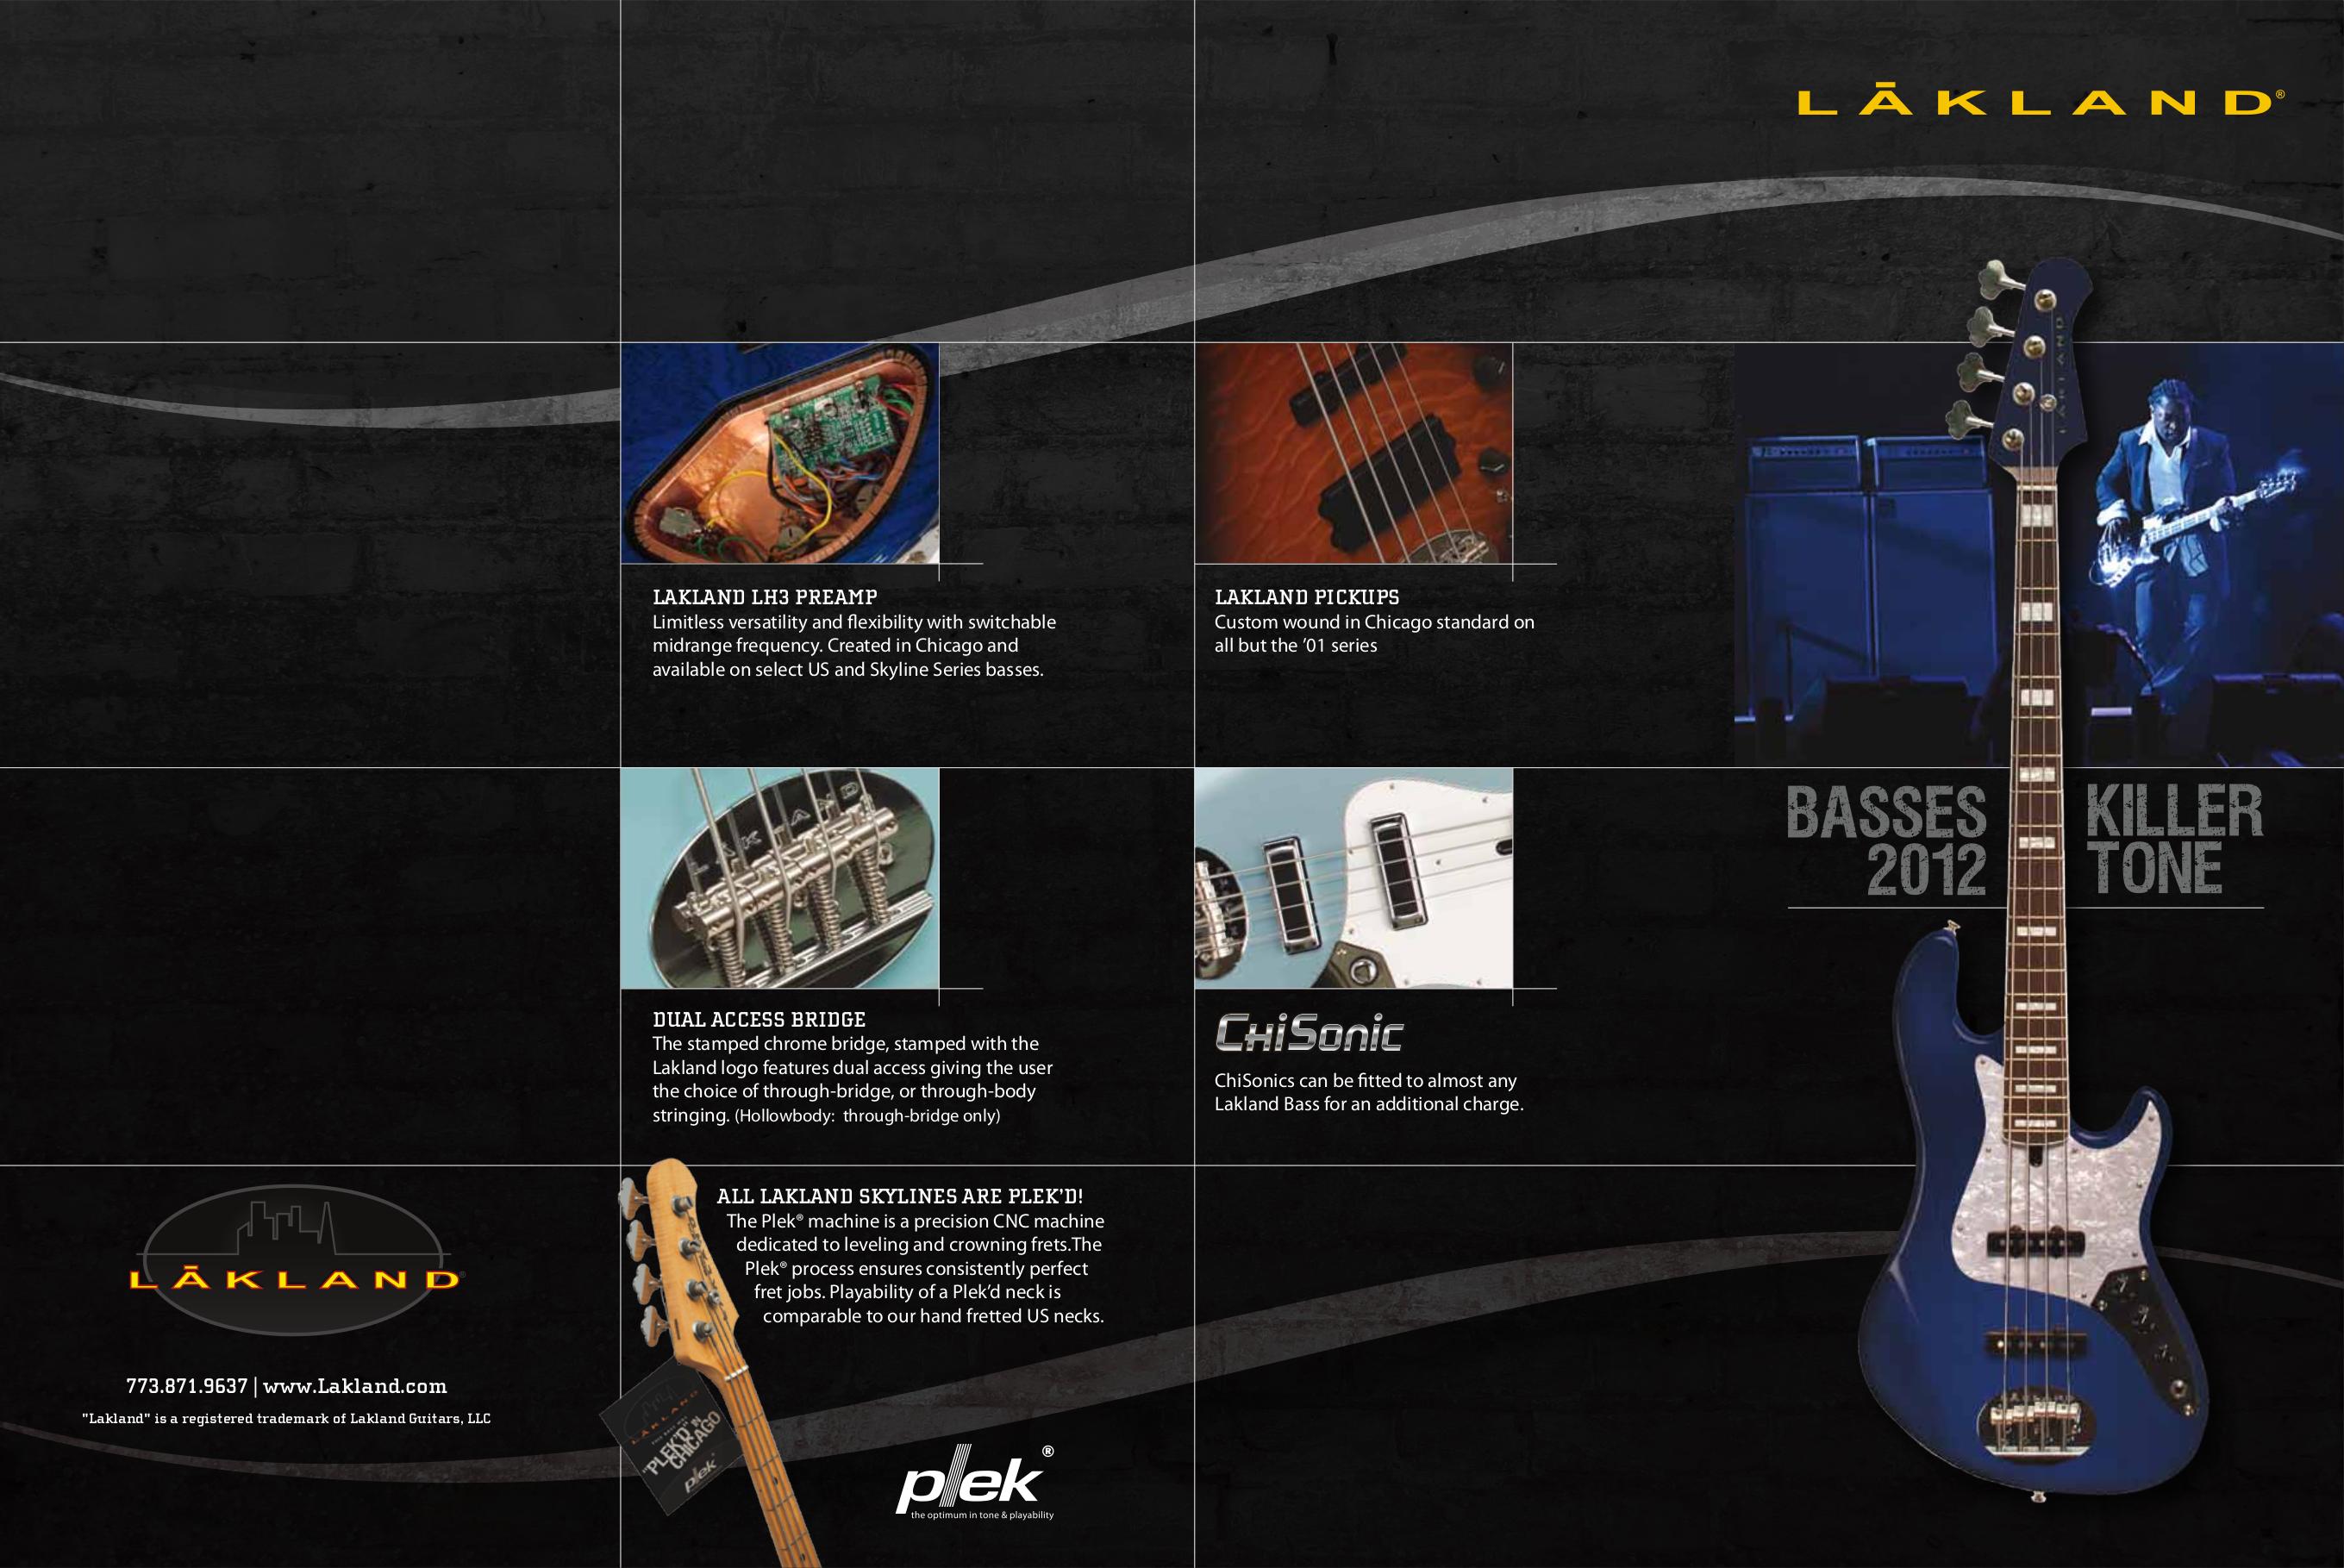 pdf for Lakland Guitar Skyline 44-01 manual